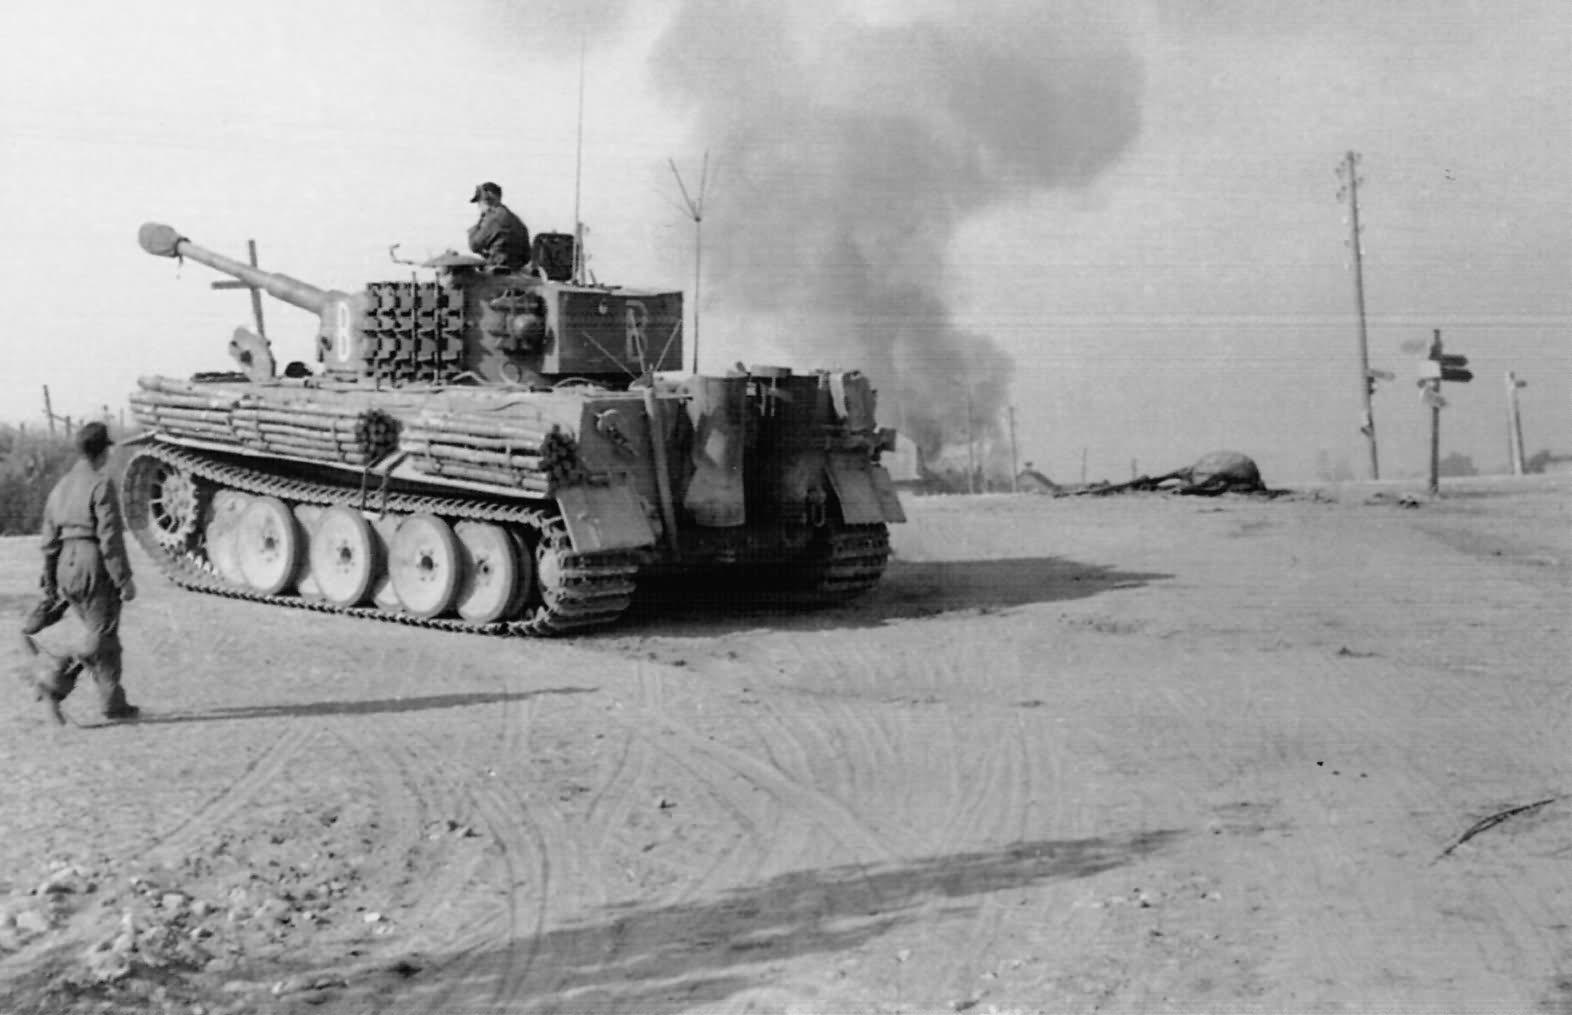 befehls Tiger code B of 507 Schwere Panzer Abteilung, Eastern front 1944